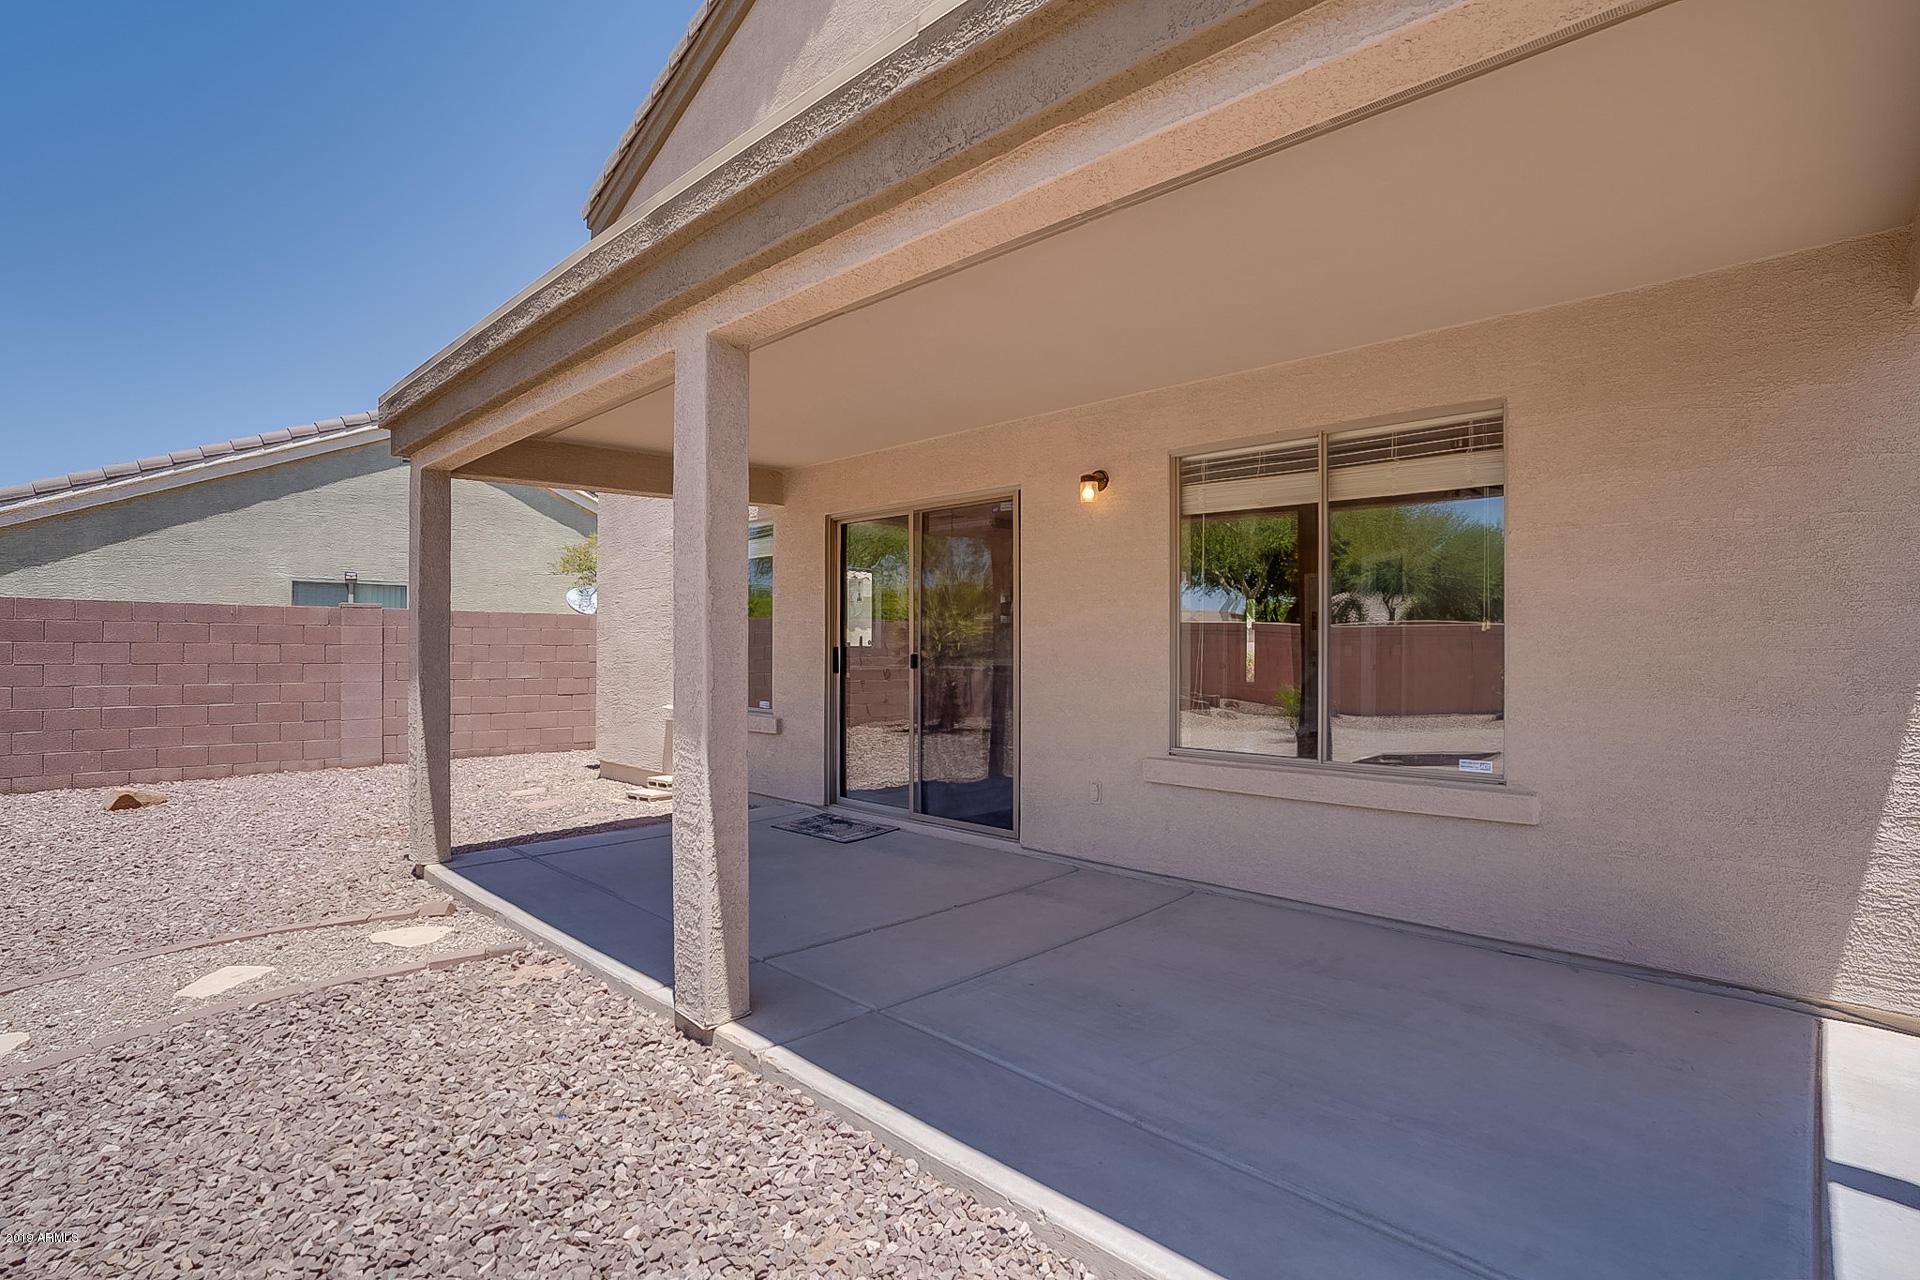 MLS 5949420 2079 N PINE Place, Casa Grande, AZ 85122 Casa Grande AZ Mission Valley